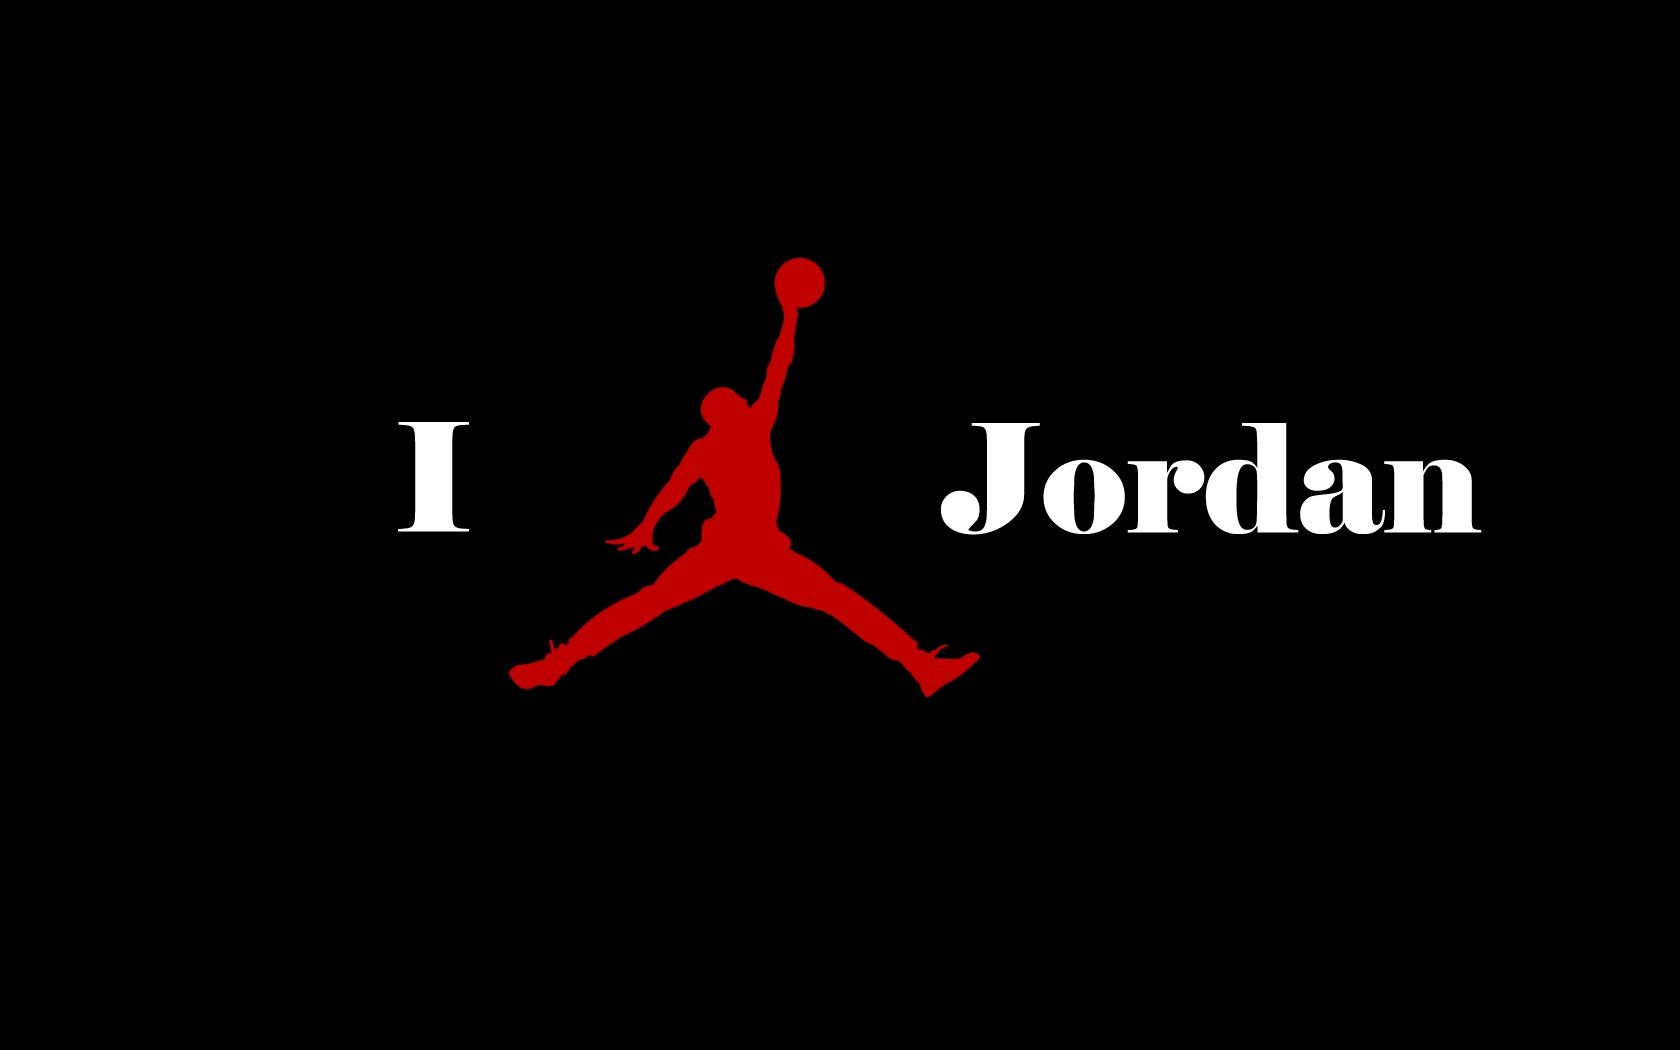 Michael Jordan Wallpaper And Background Image 1680x1050